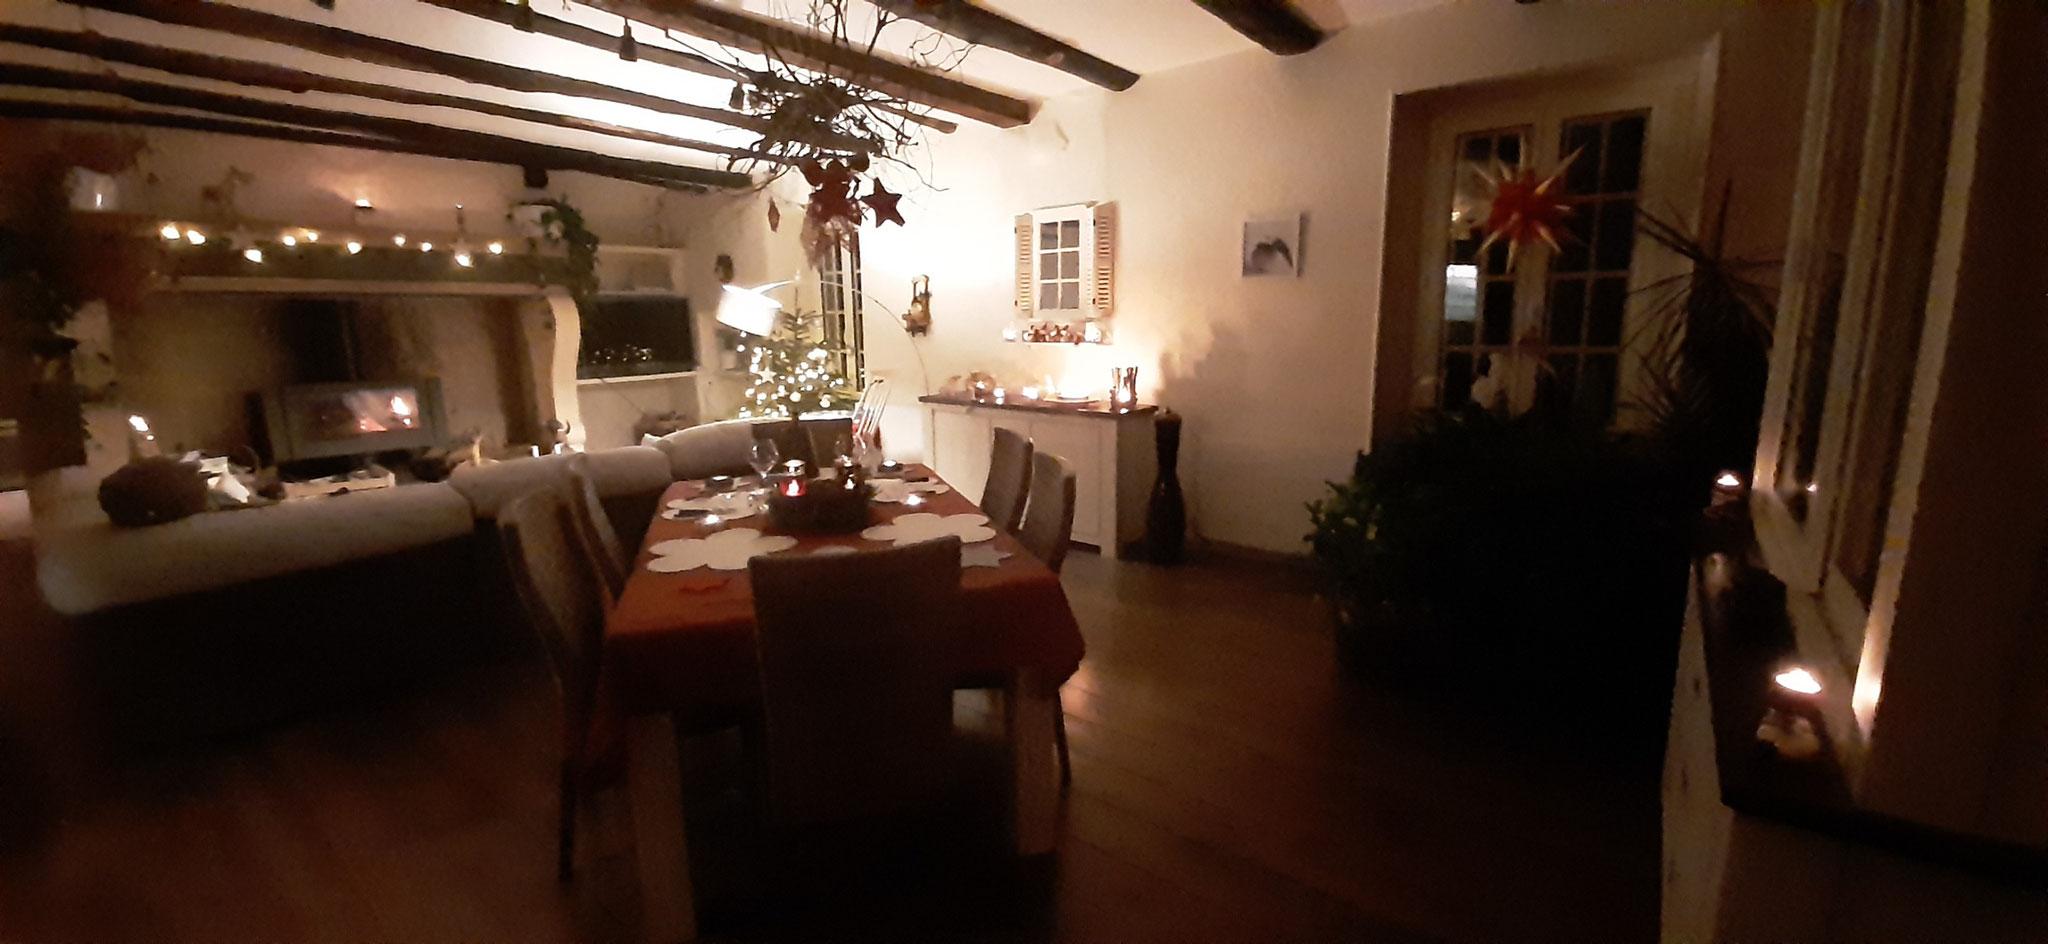 Ambiance de Noël à Perrot